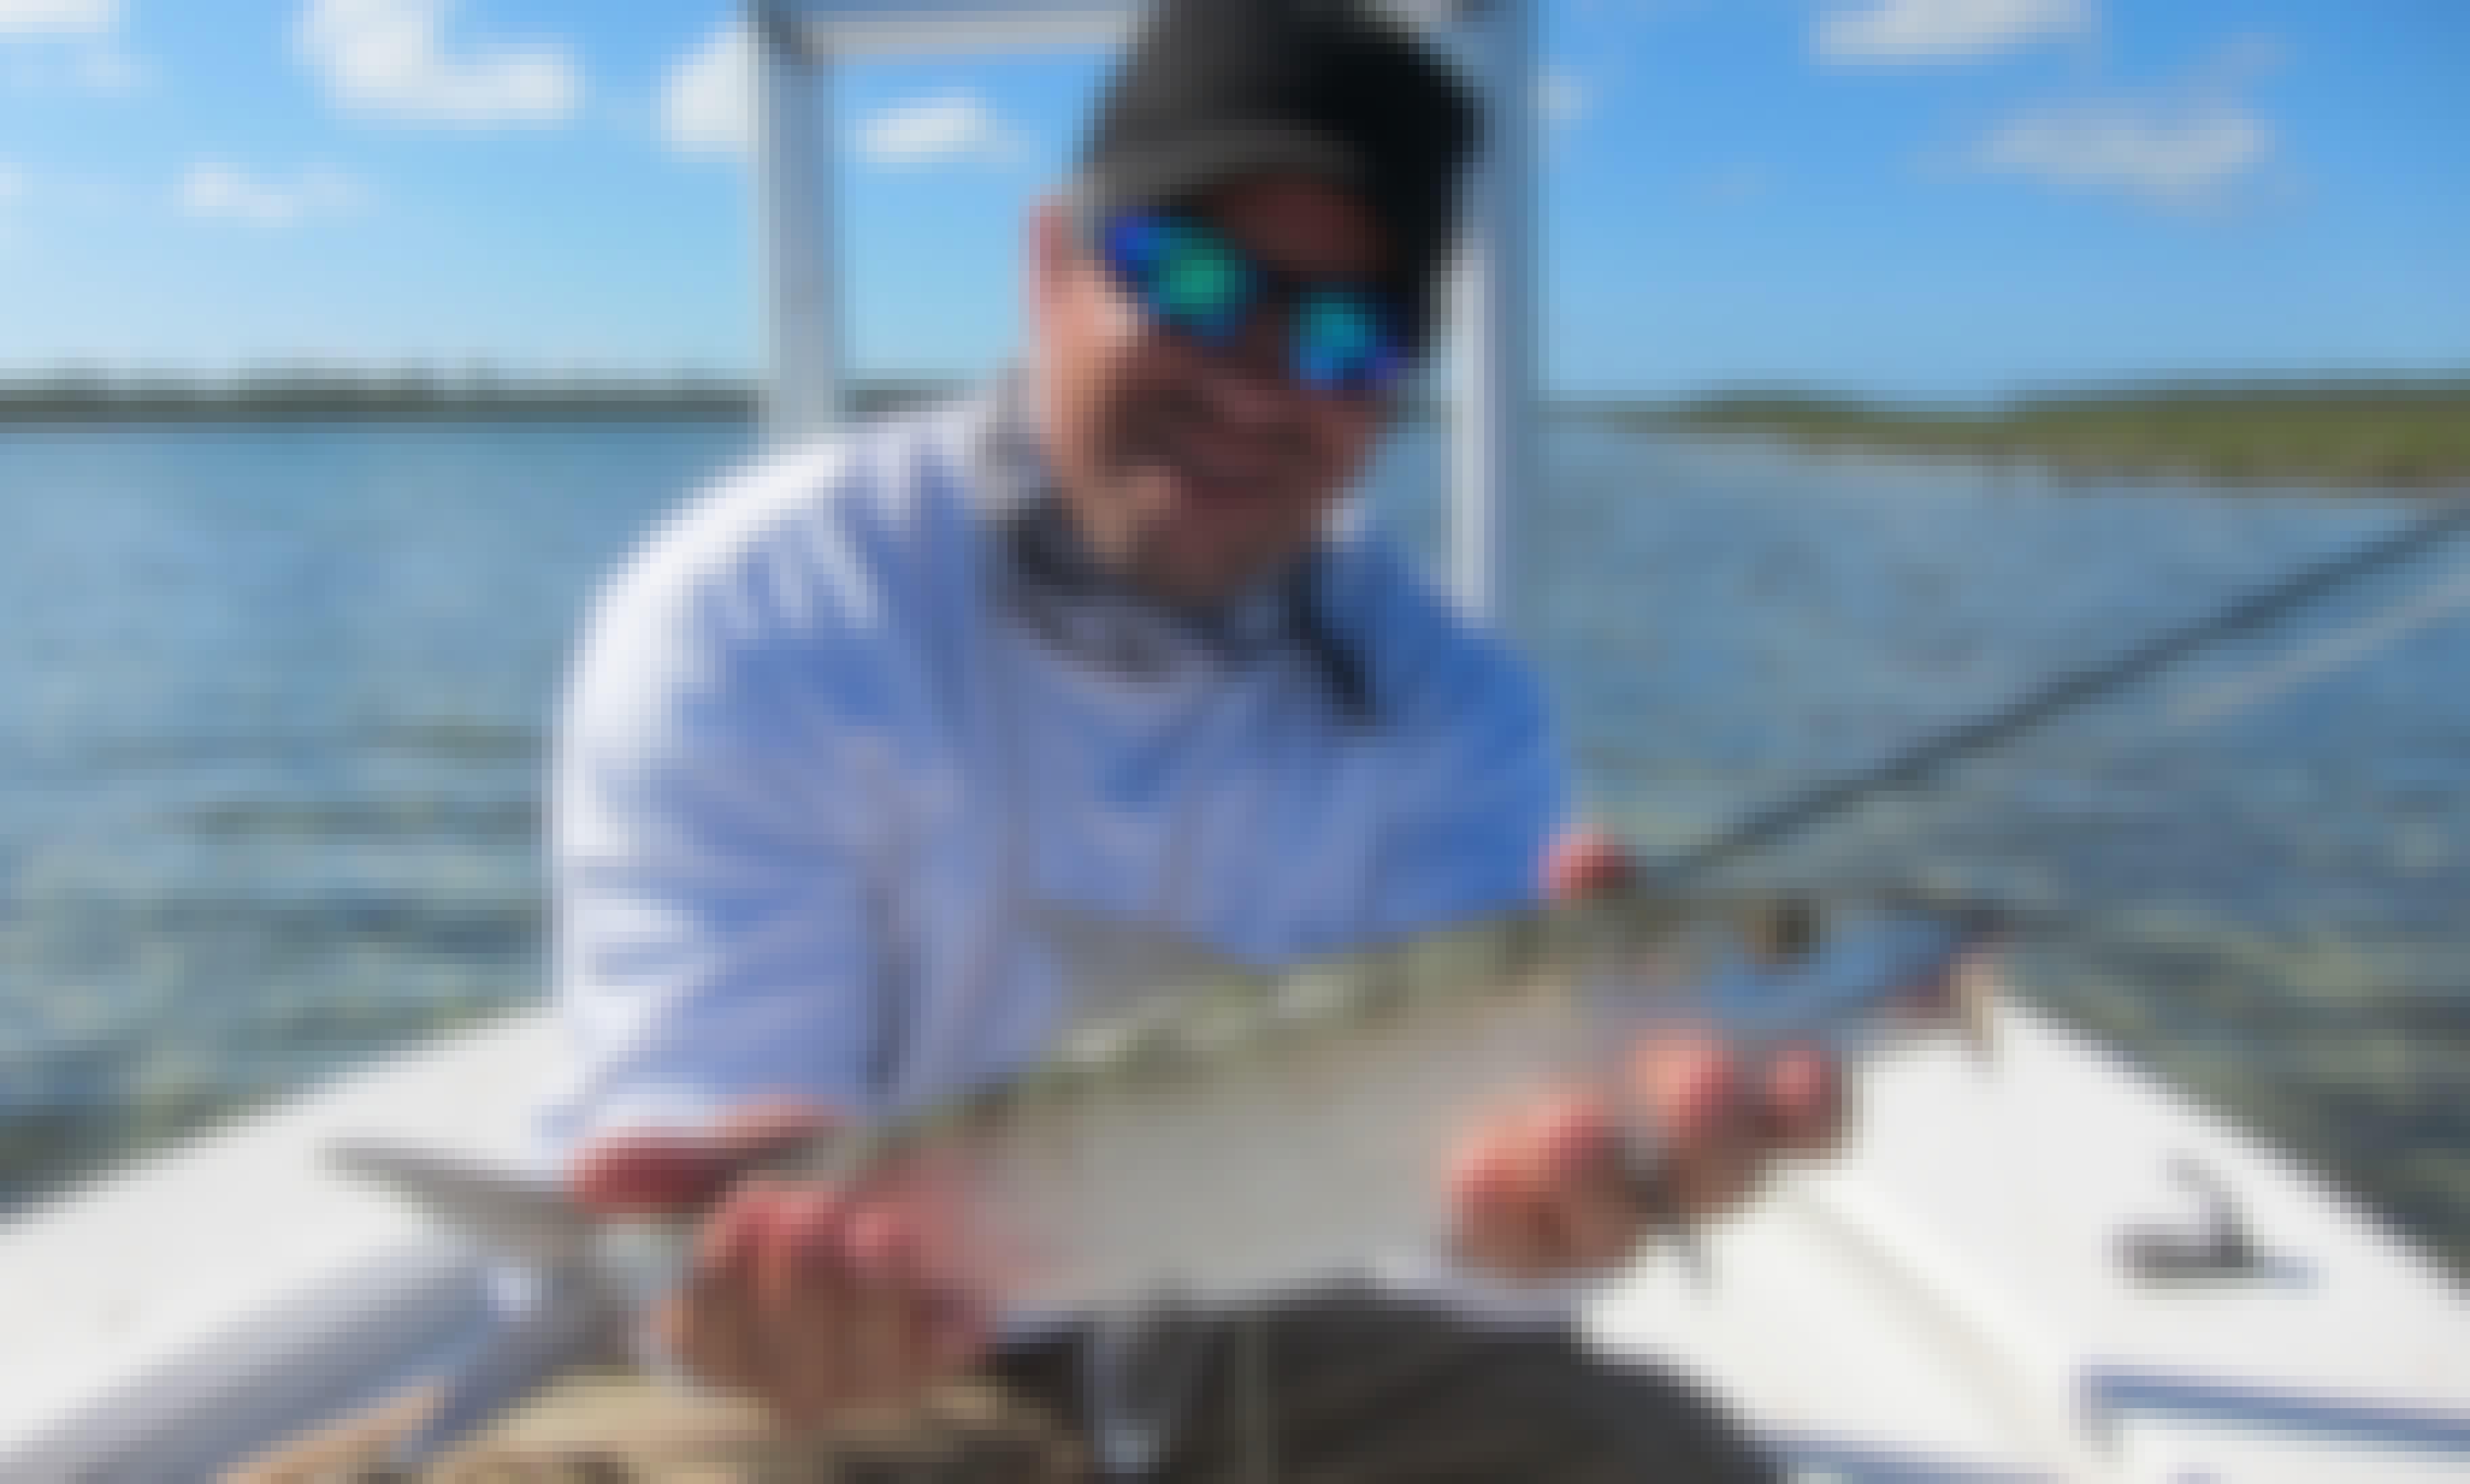 Fishing Charter On 17' Mavericks Flat Skiffs Boat With Captain Phil